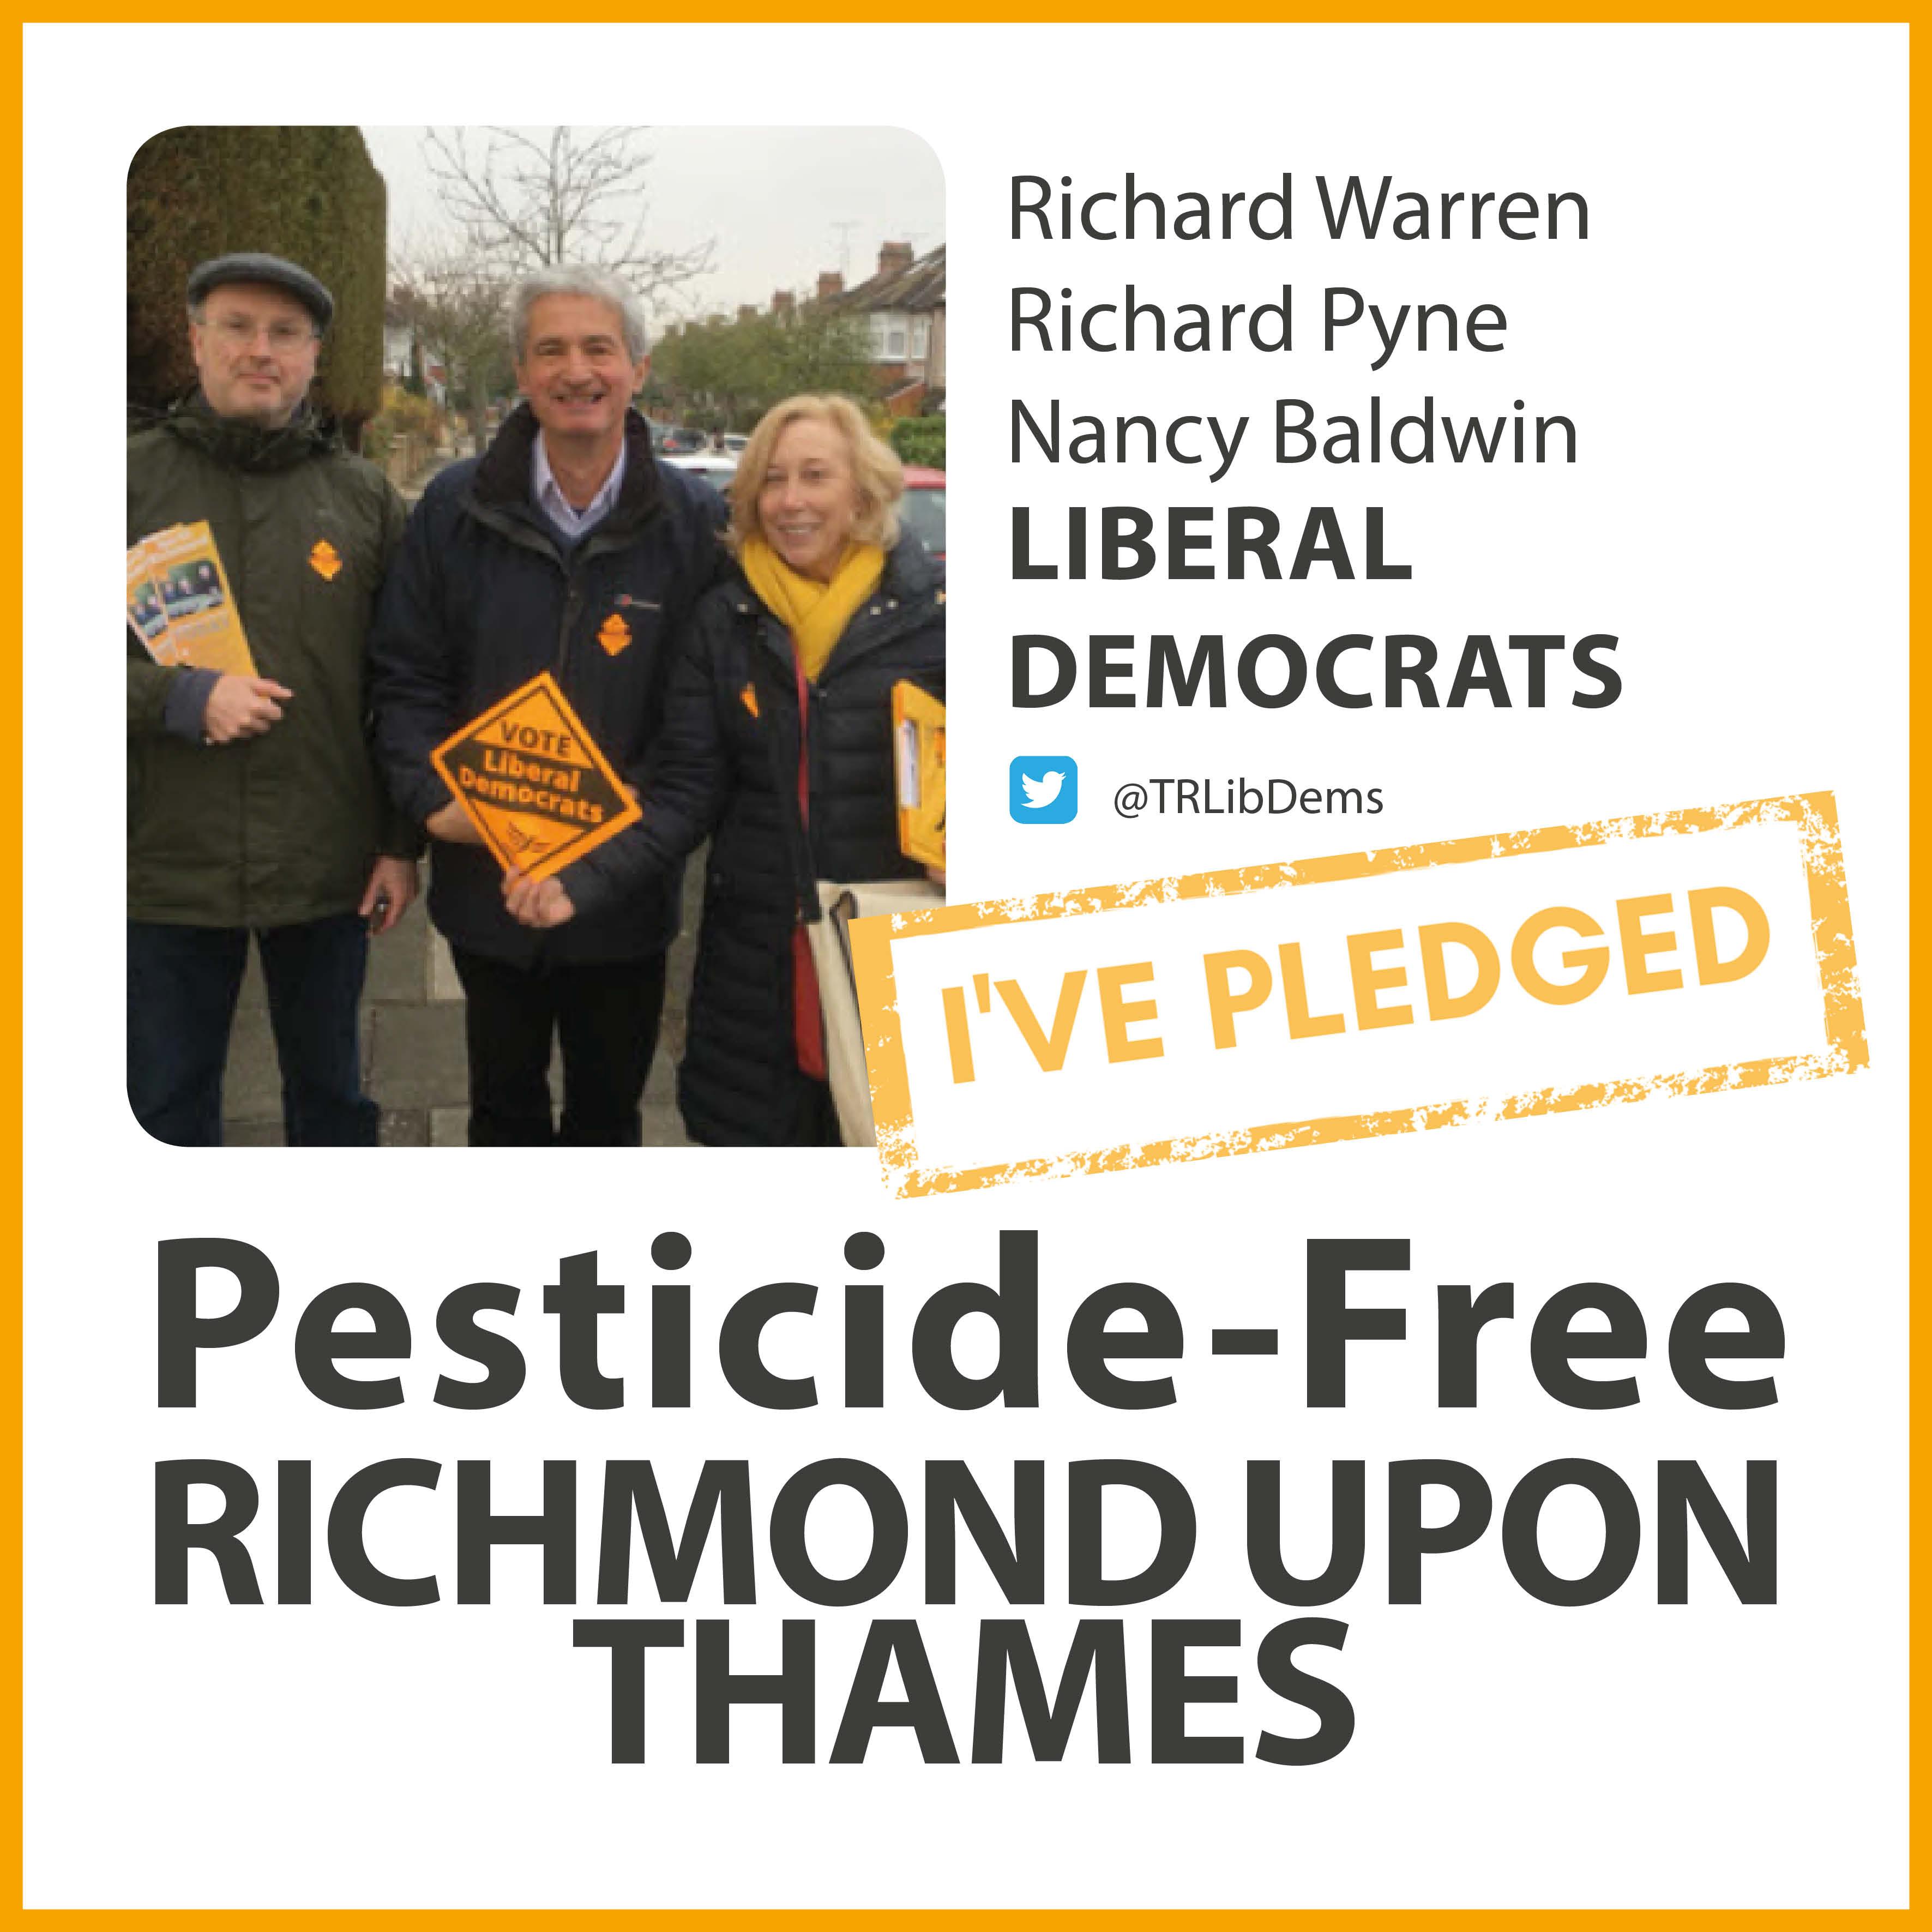 North Richmond Lib Dems have taken the pesticide-free pledge